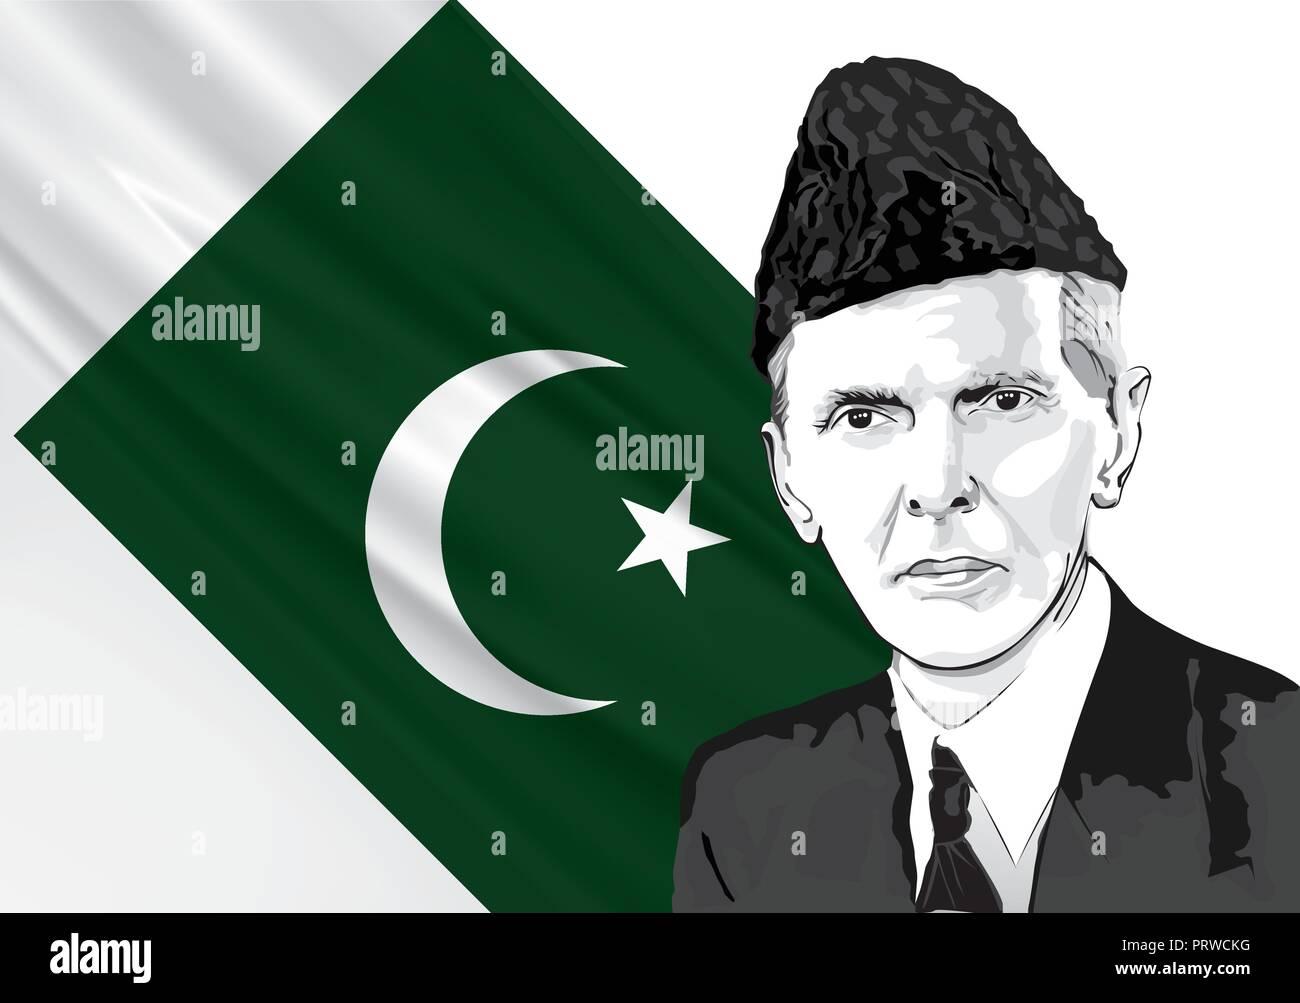 Muhammadali jinna. father of the nation Pakistan. - Stock Image